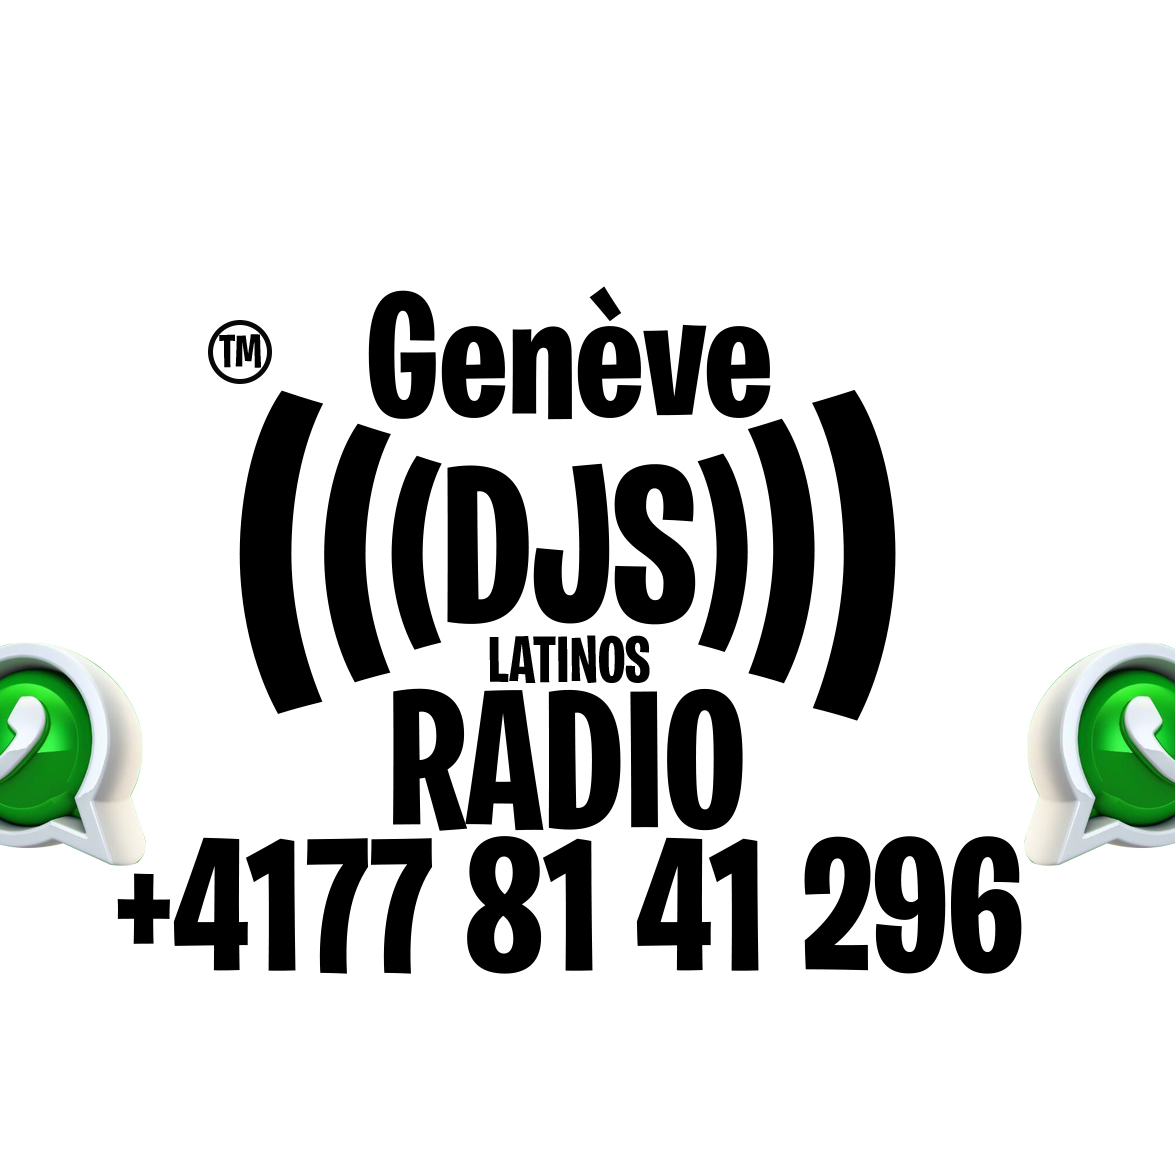 DJs LatinosGenève